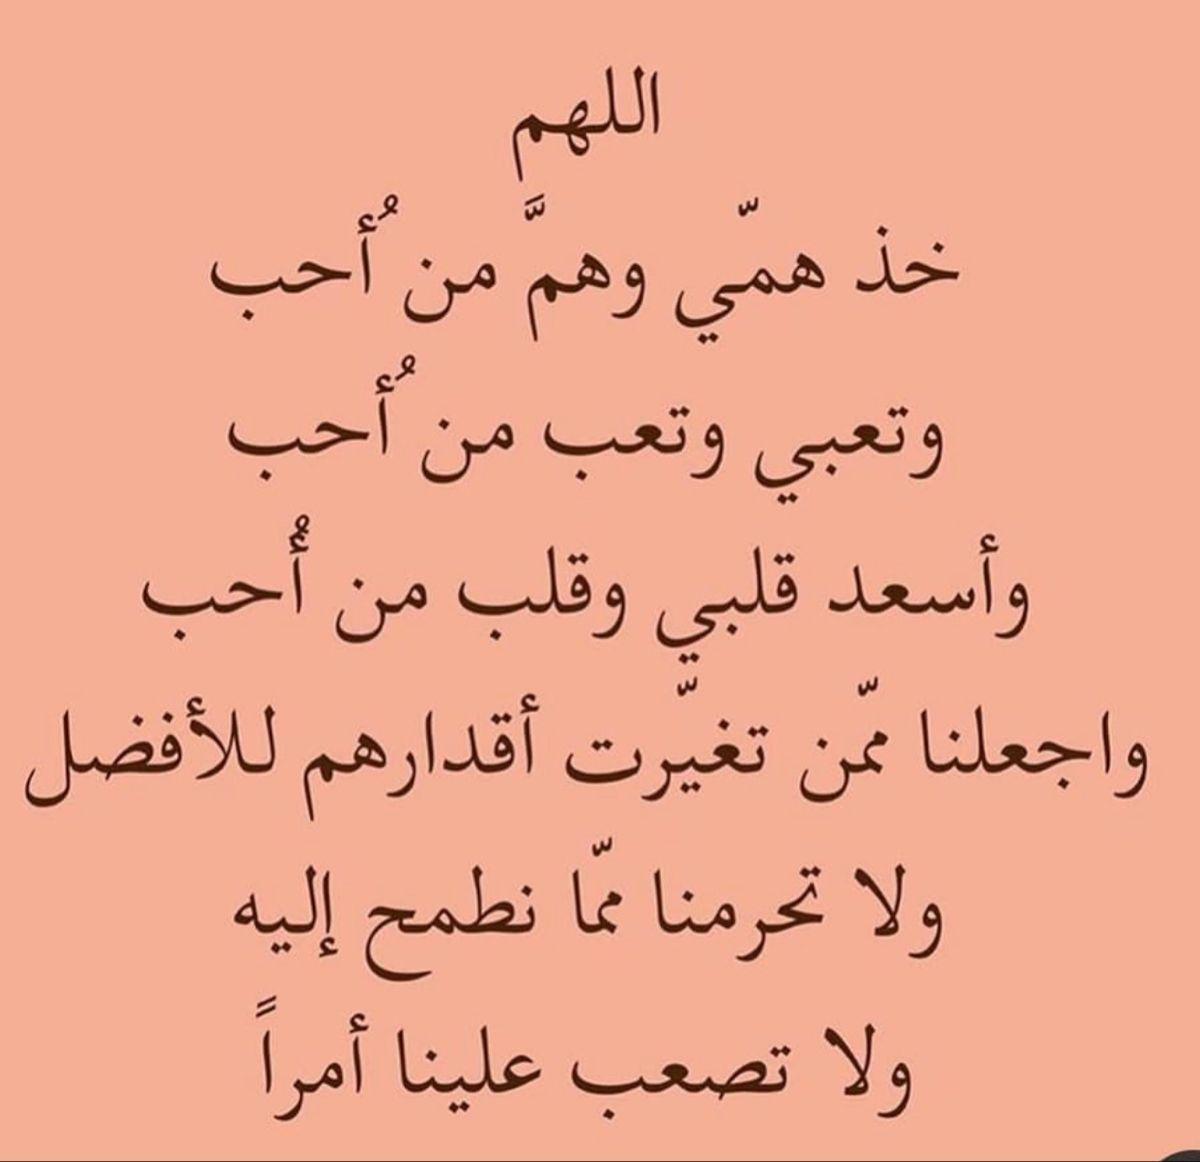 Pin By Eman Soliman On دعوة صادقة من قلب صادق 3 Beautiful Arabic Words Words Arabic Words